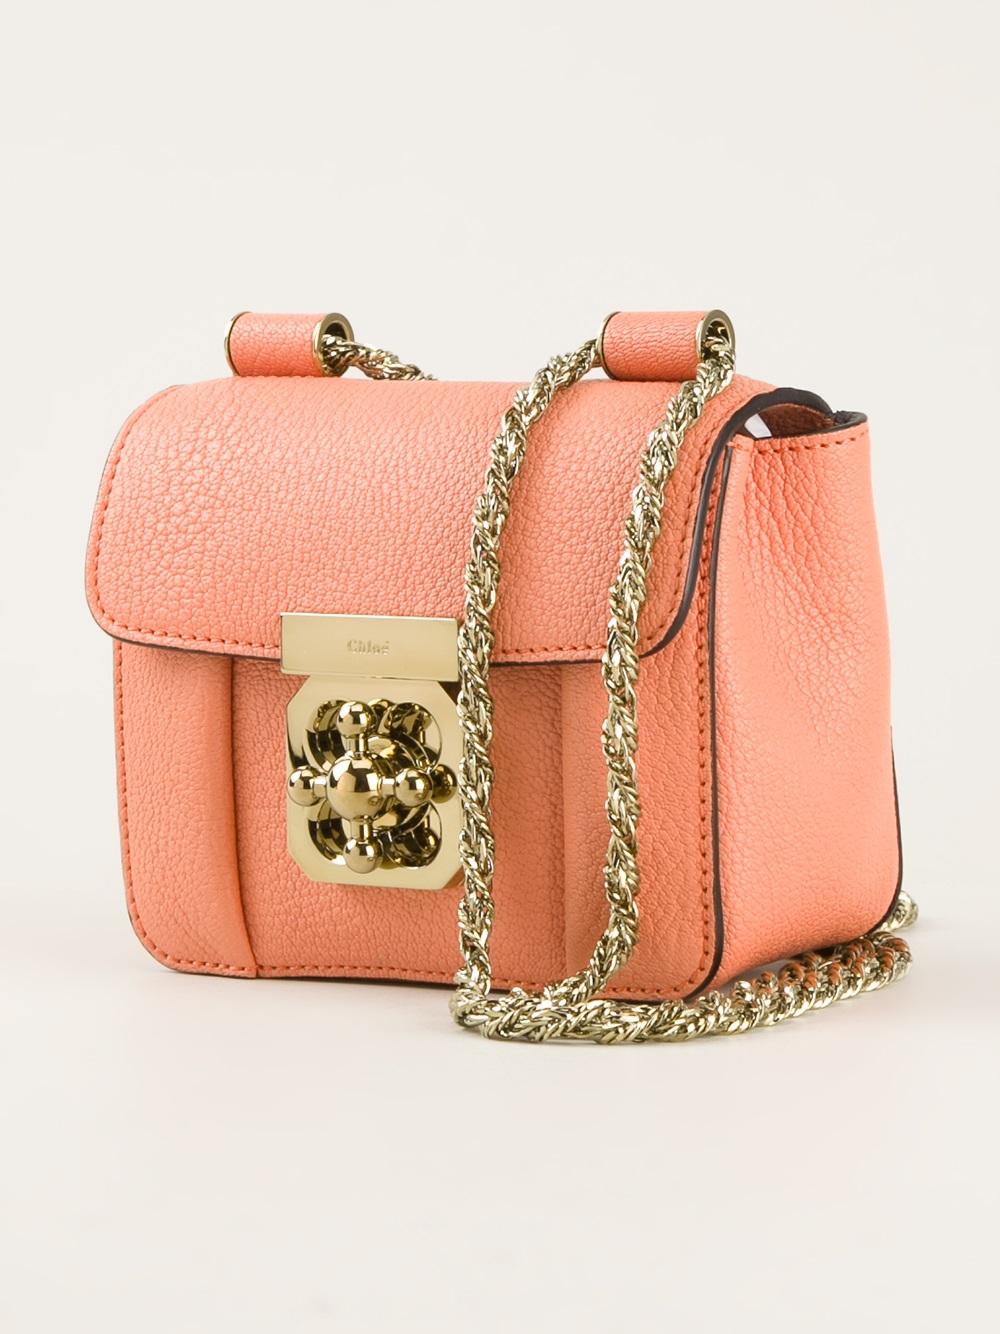 chloe embellished clutch